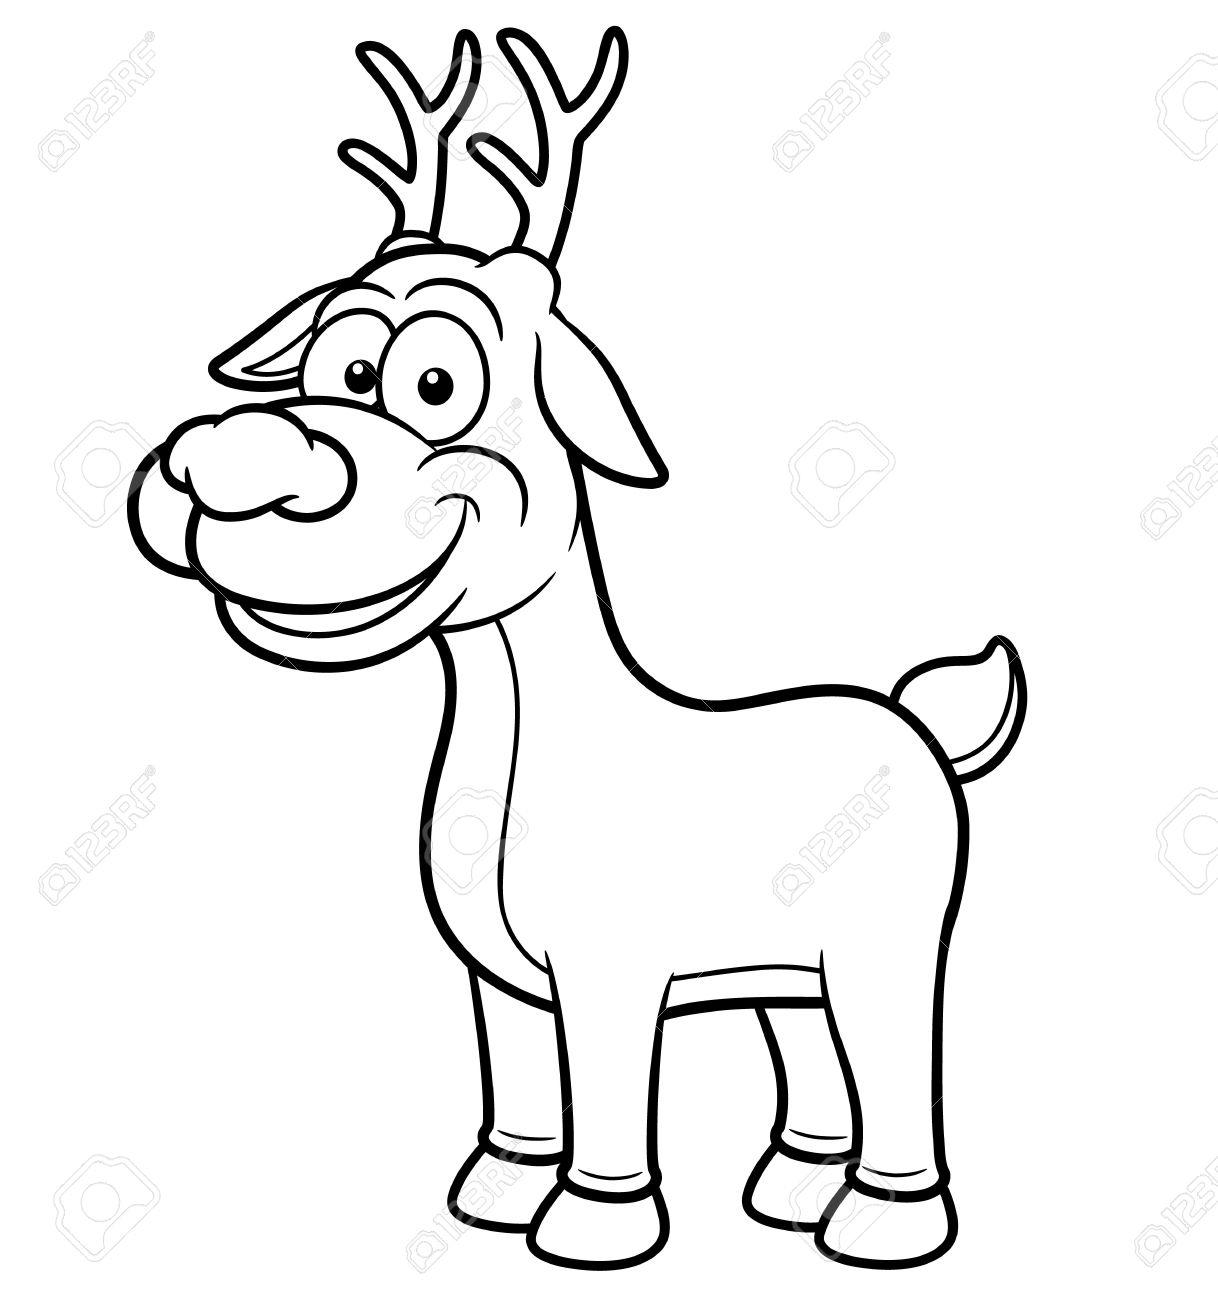 1218x1300 Cartoon Drawing Of A Deer Vector Illustration Of Deer Cartoon